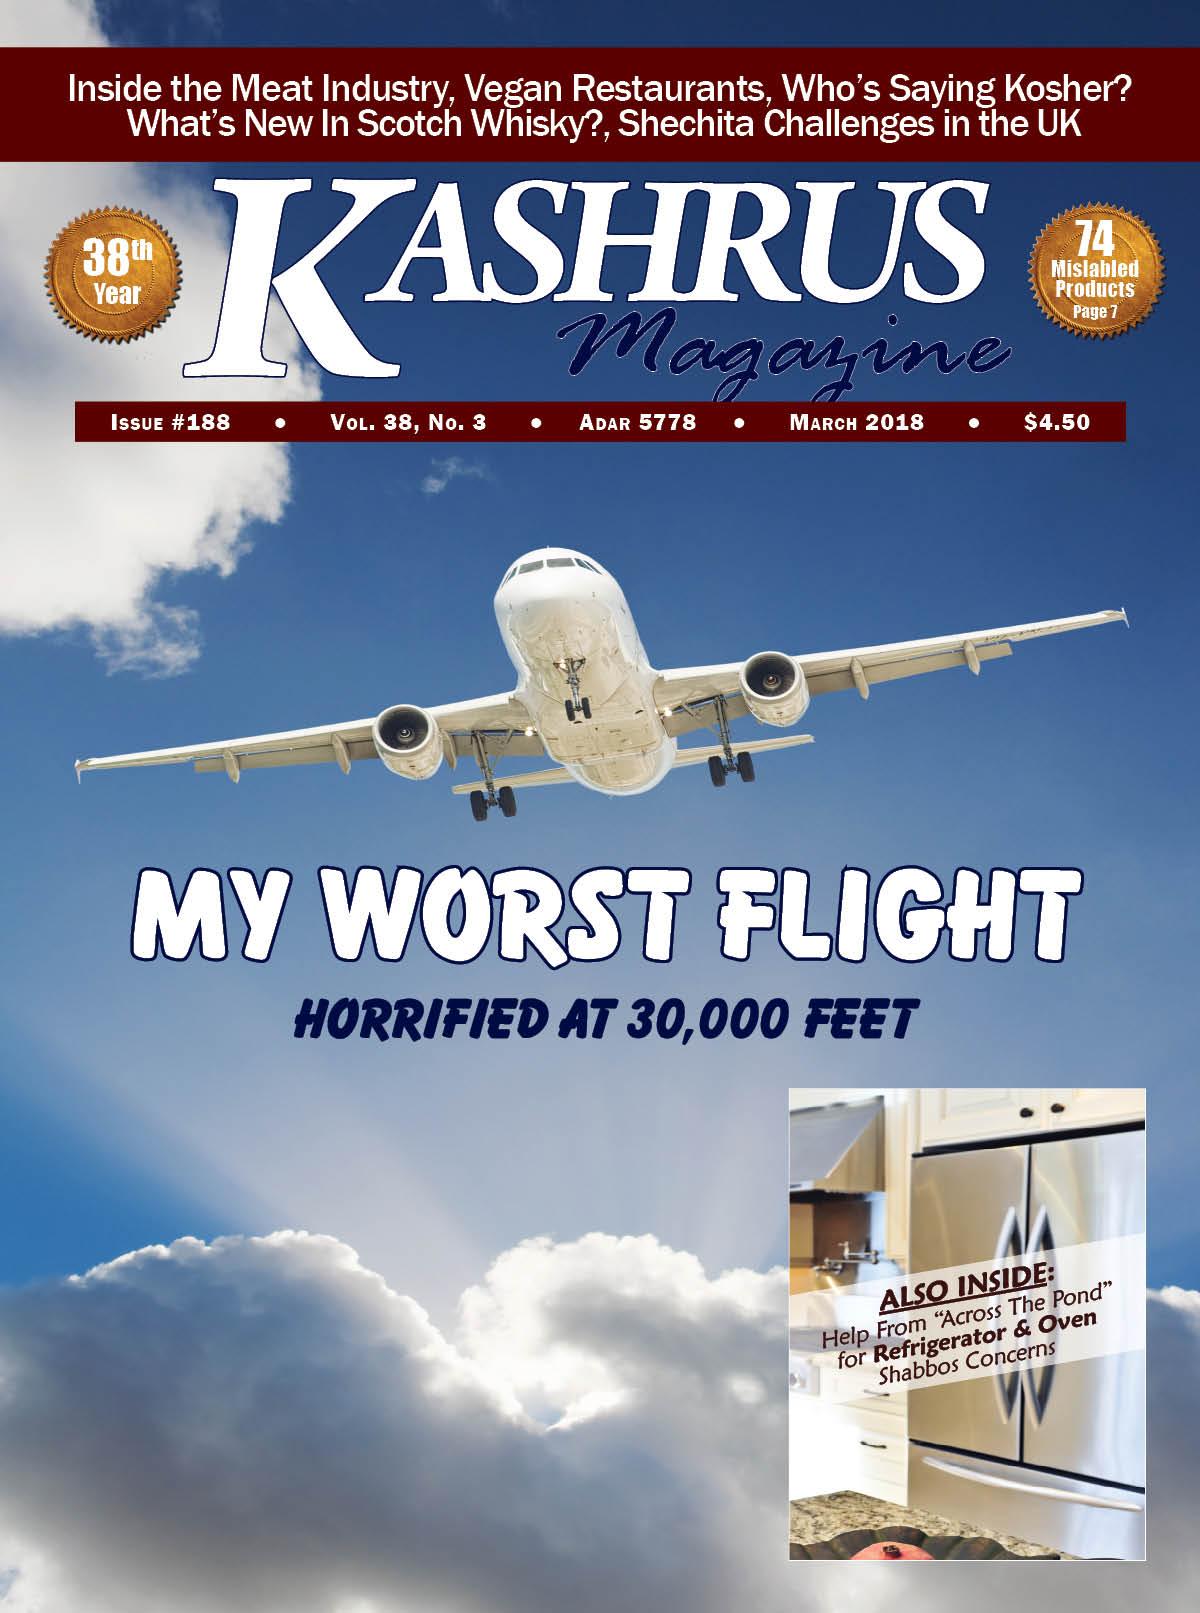 Kashrus magazine online the guide for the kosher consumer march 2018 buycottarizona Choice Image